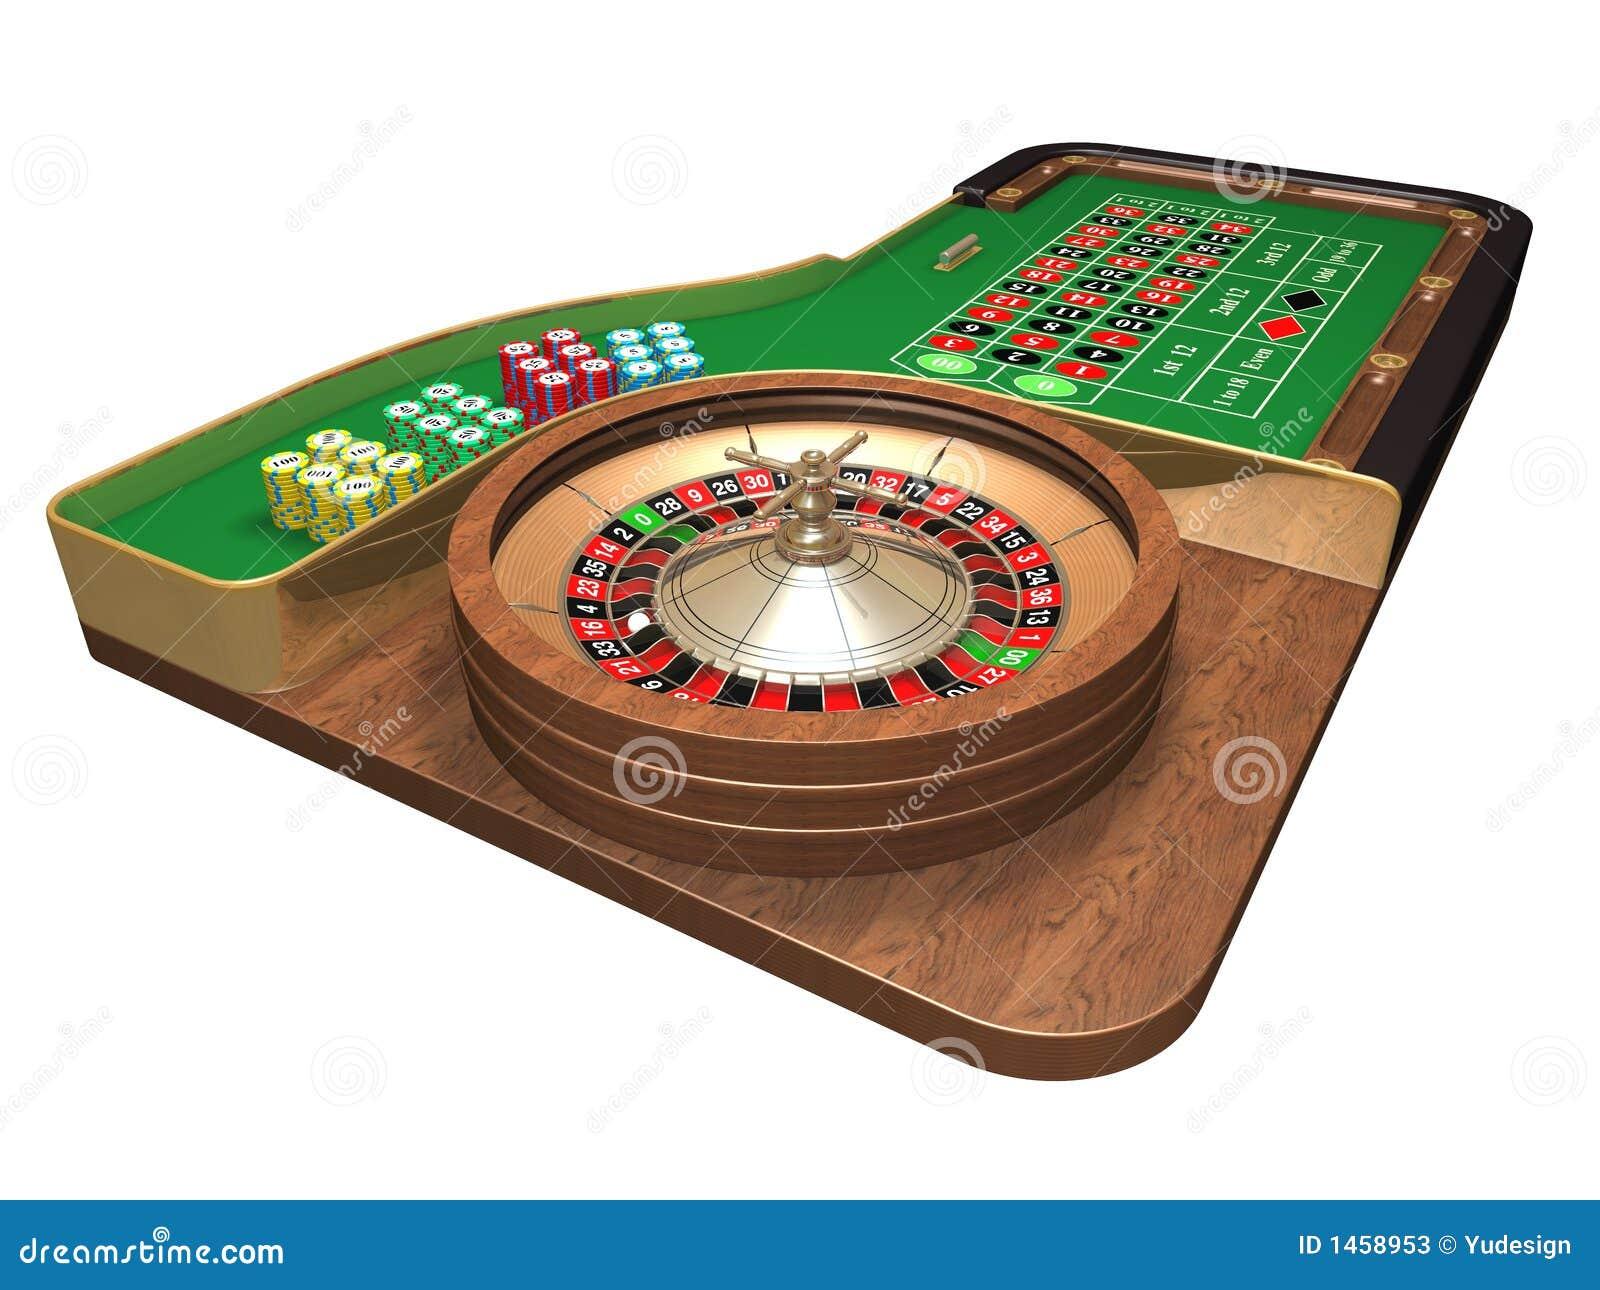 Vente roulette de casino slot car racing tracks melbourne